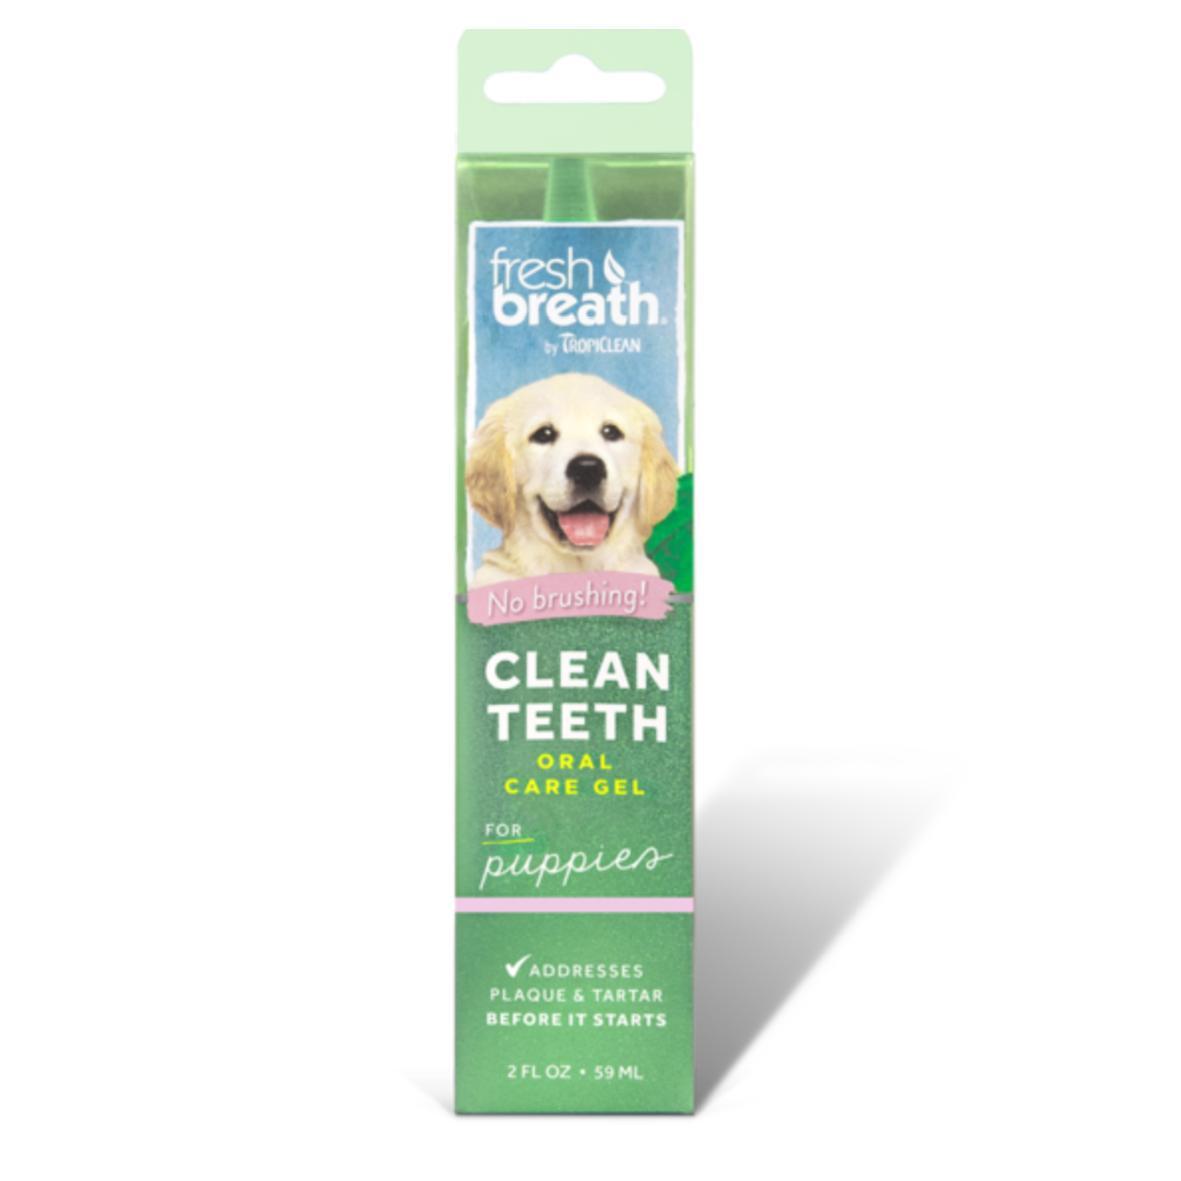 TropiClean Fresh Breath Oral Care Gel for Puppies 59ml